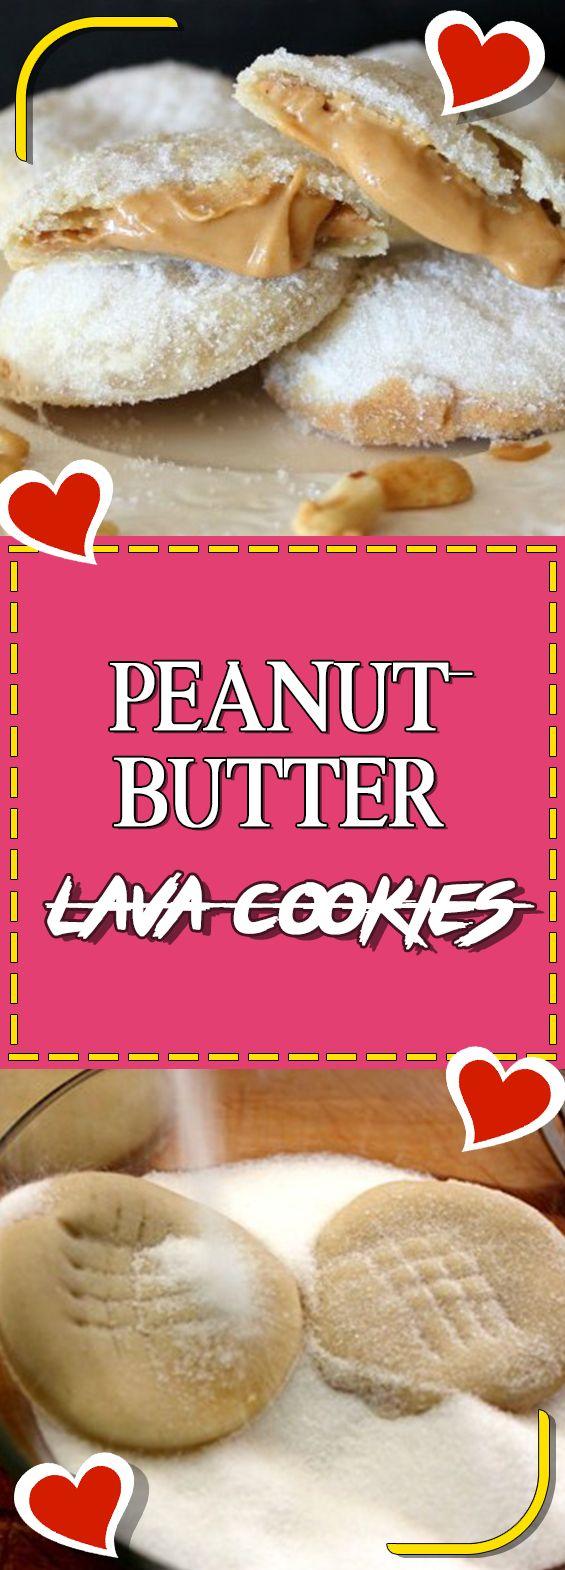 Peanut butter lava cookies.